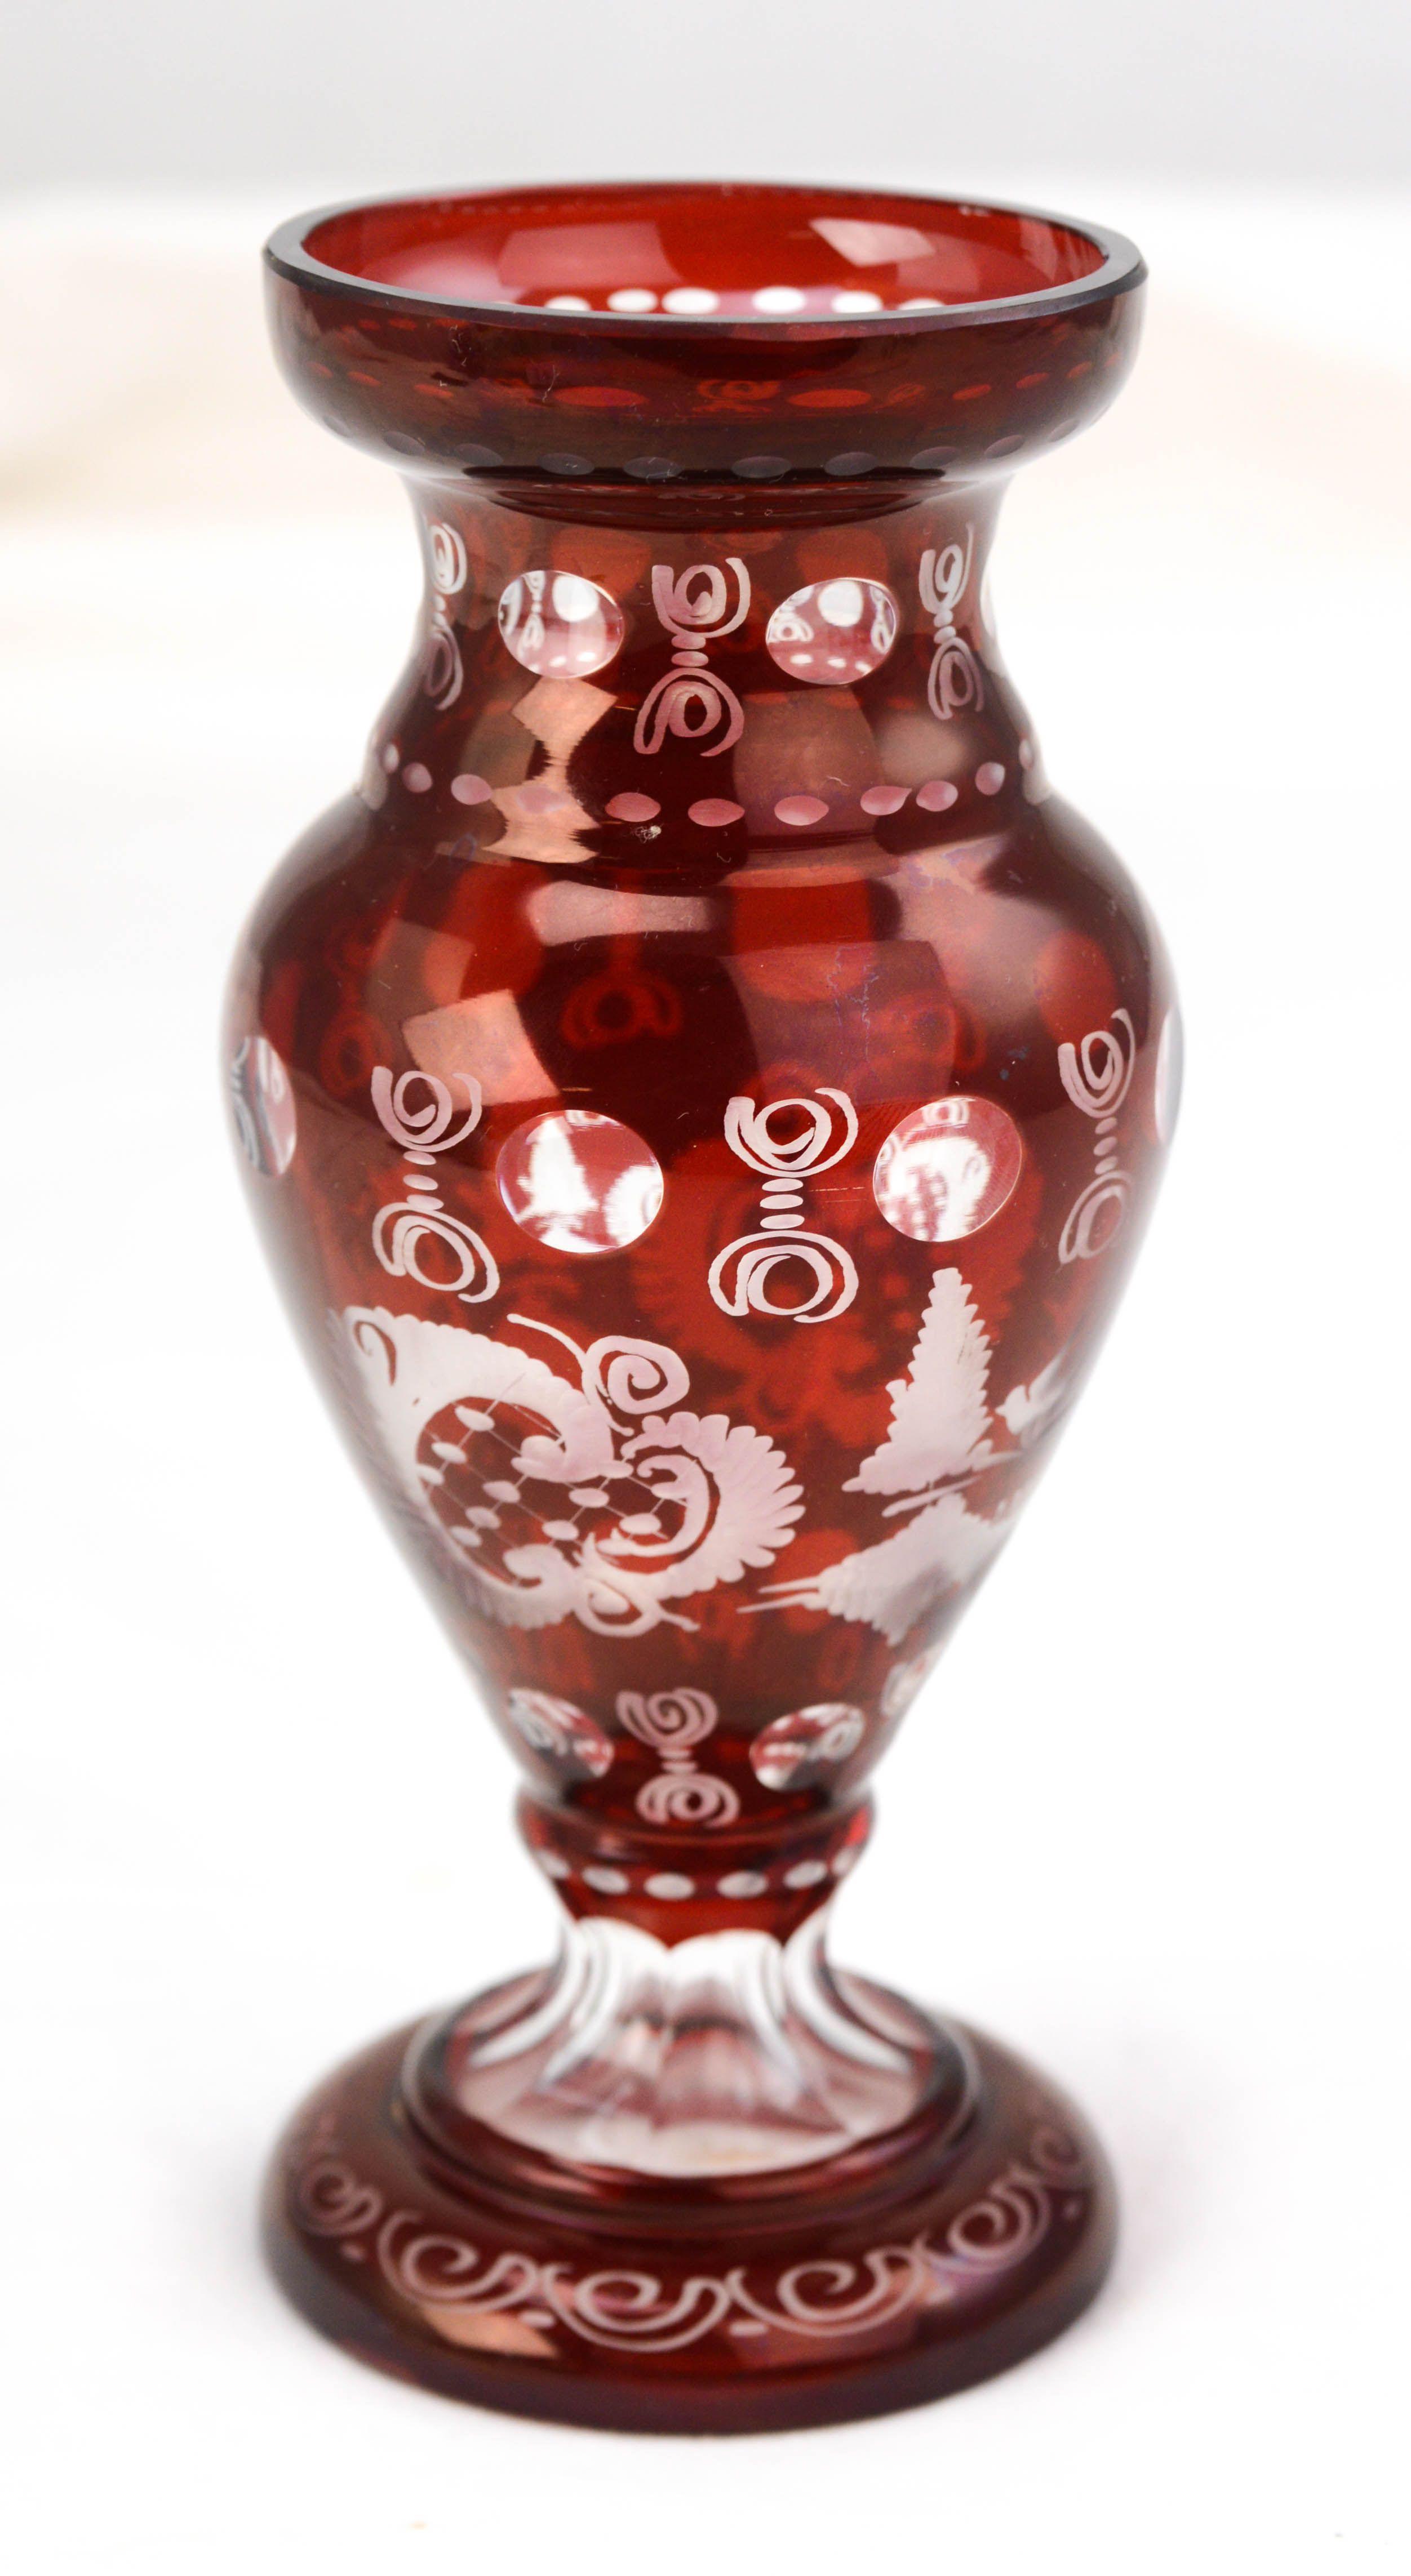 floating candle vases uk of glass cylinder vases cheap fresh vtg bohemian egermann ruby red cut throughout glass cylinder vases cheap fresh vtg bohemian egermann ruby red cut to clear etched glass bird